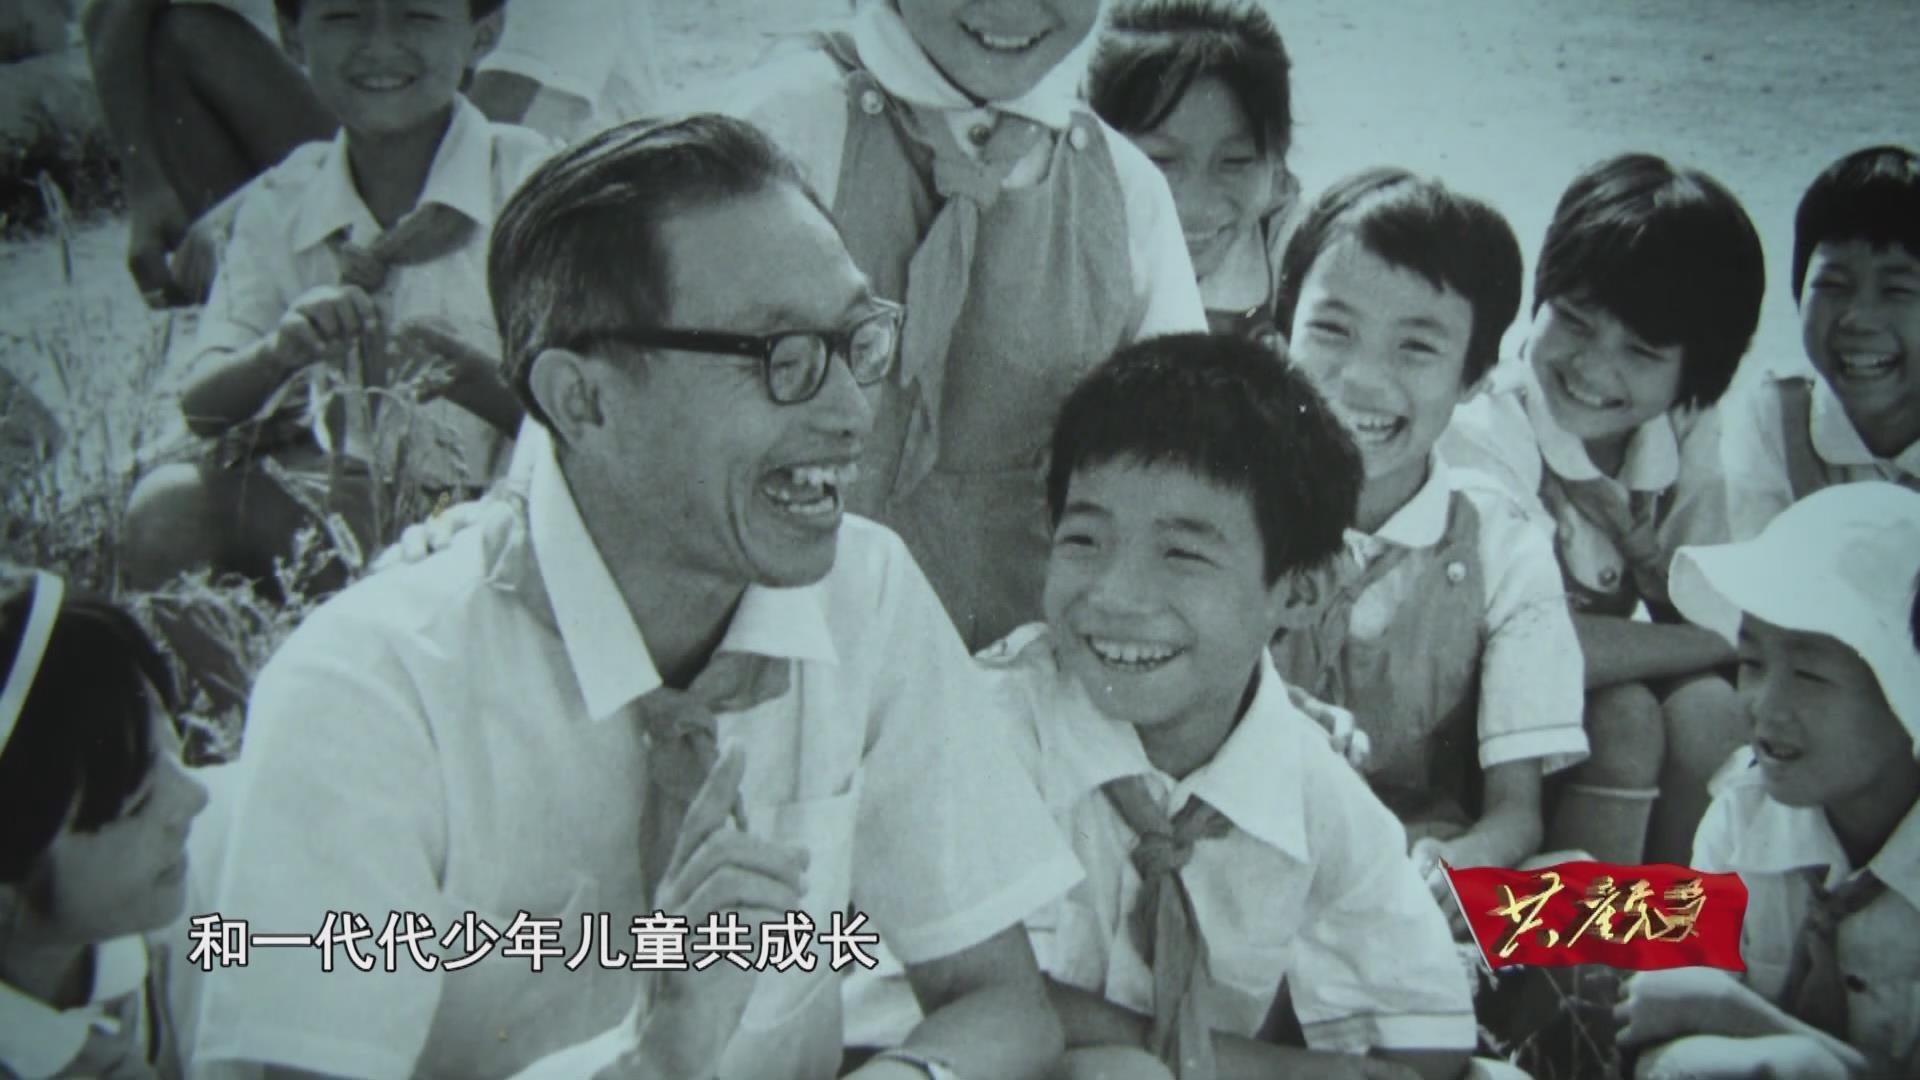 <b>88岁少先队辅导员一条红领巾一戴一辈子</b>